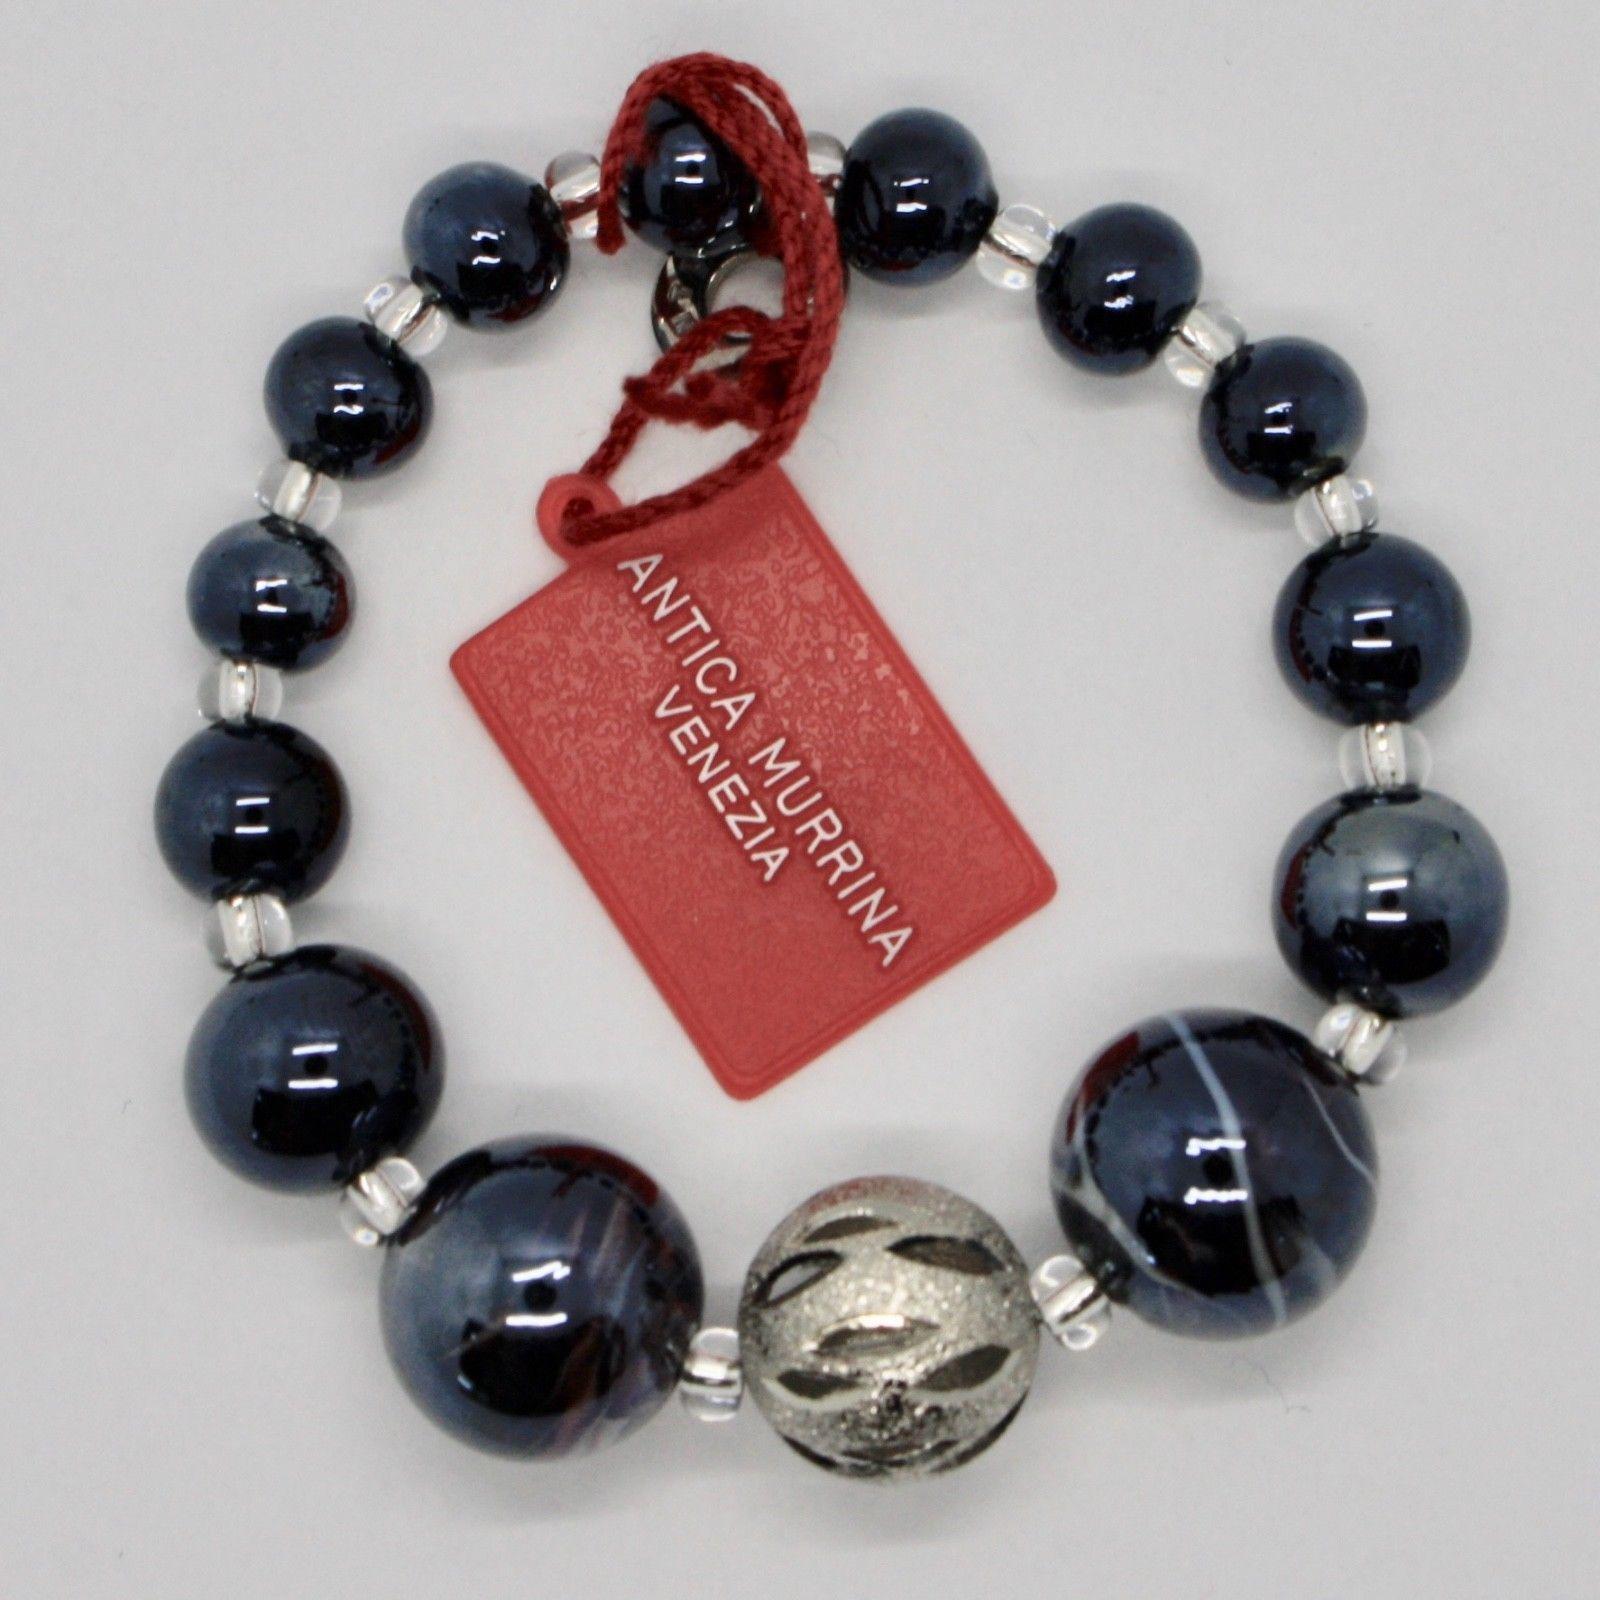 ANTICA MURRINA VENEZIA BRACELET WITH MURANO GLASS BLACK SILVER BEIGE BR678A14